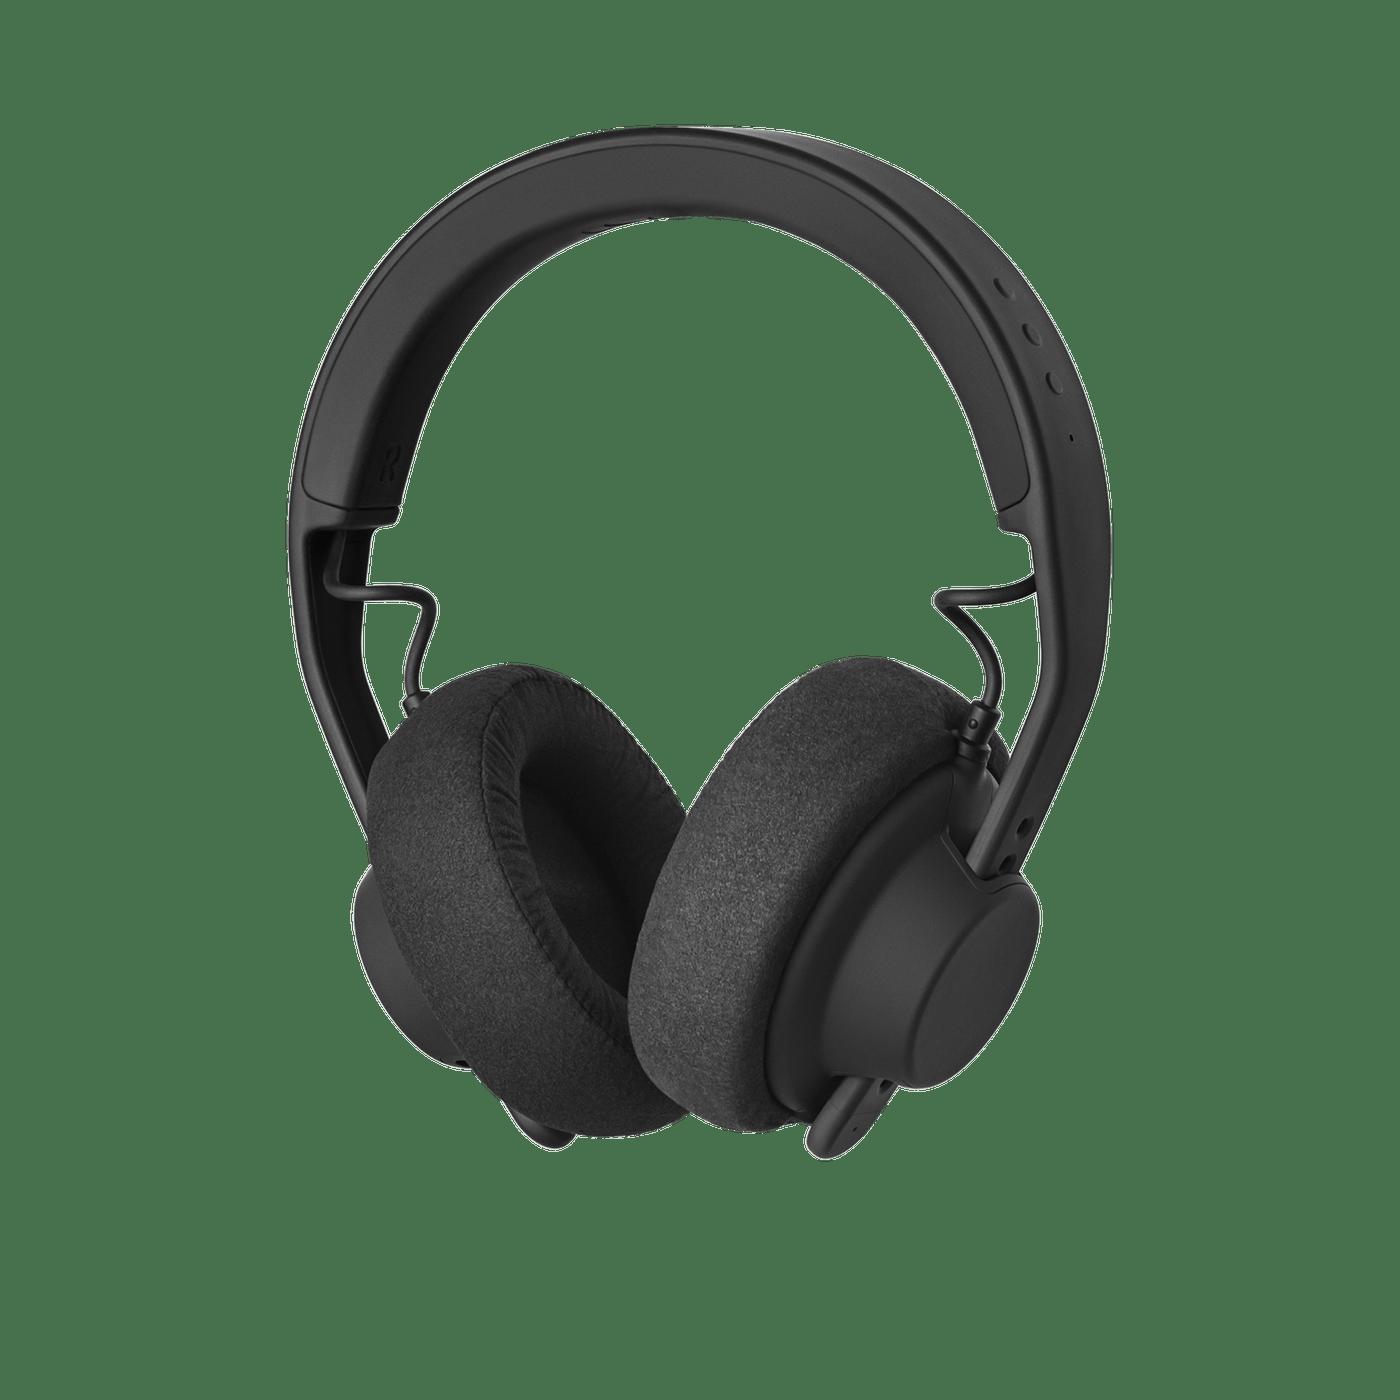 AIAIAI TMA-2 HD Wireless Headphones Jabba Reviews Audio